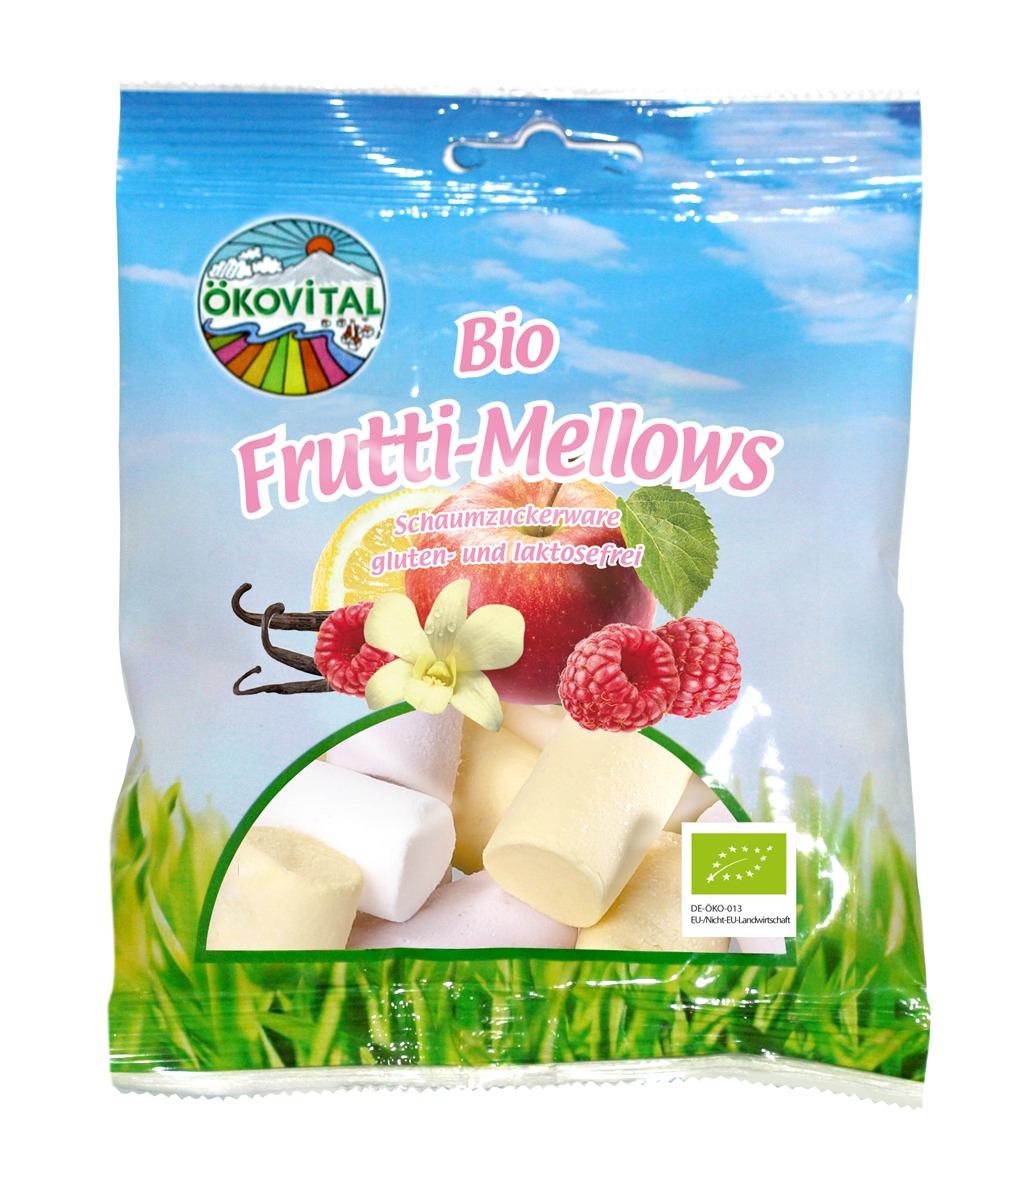 Frukt-Mellows, glutenfri, 100 g, økologisk, Ökovital